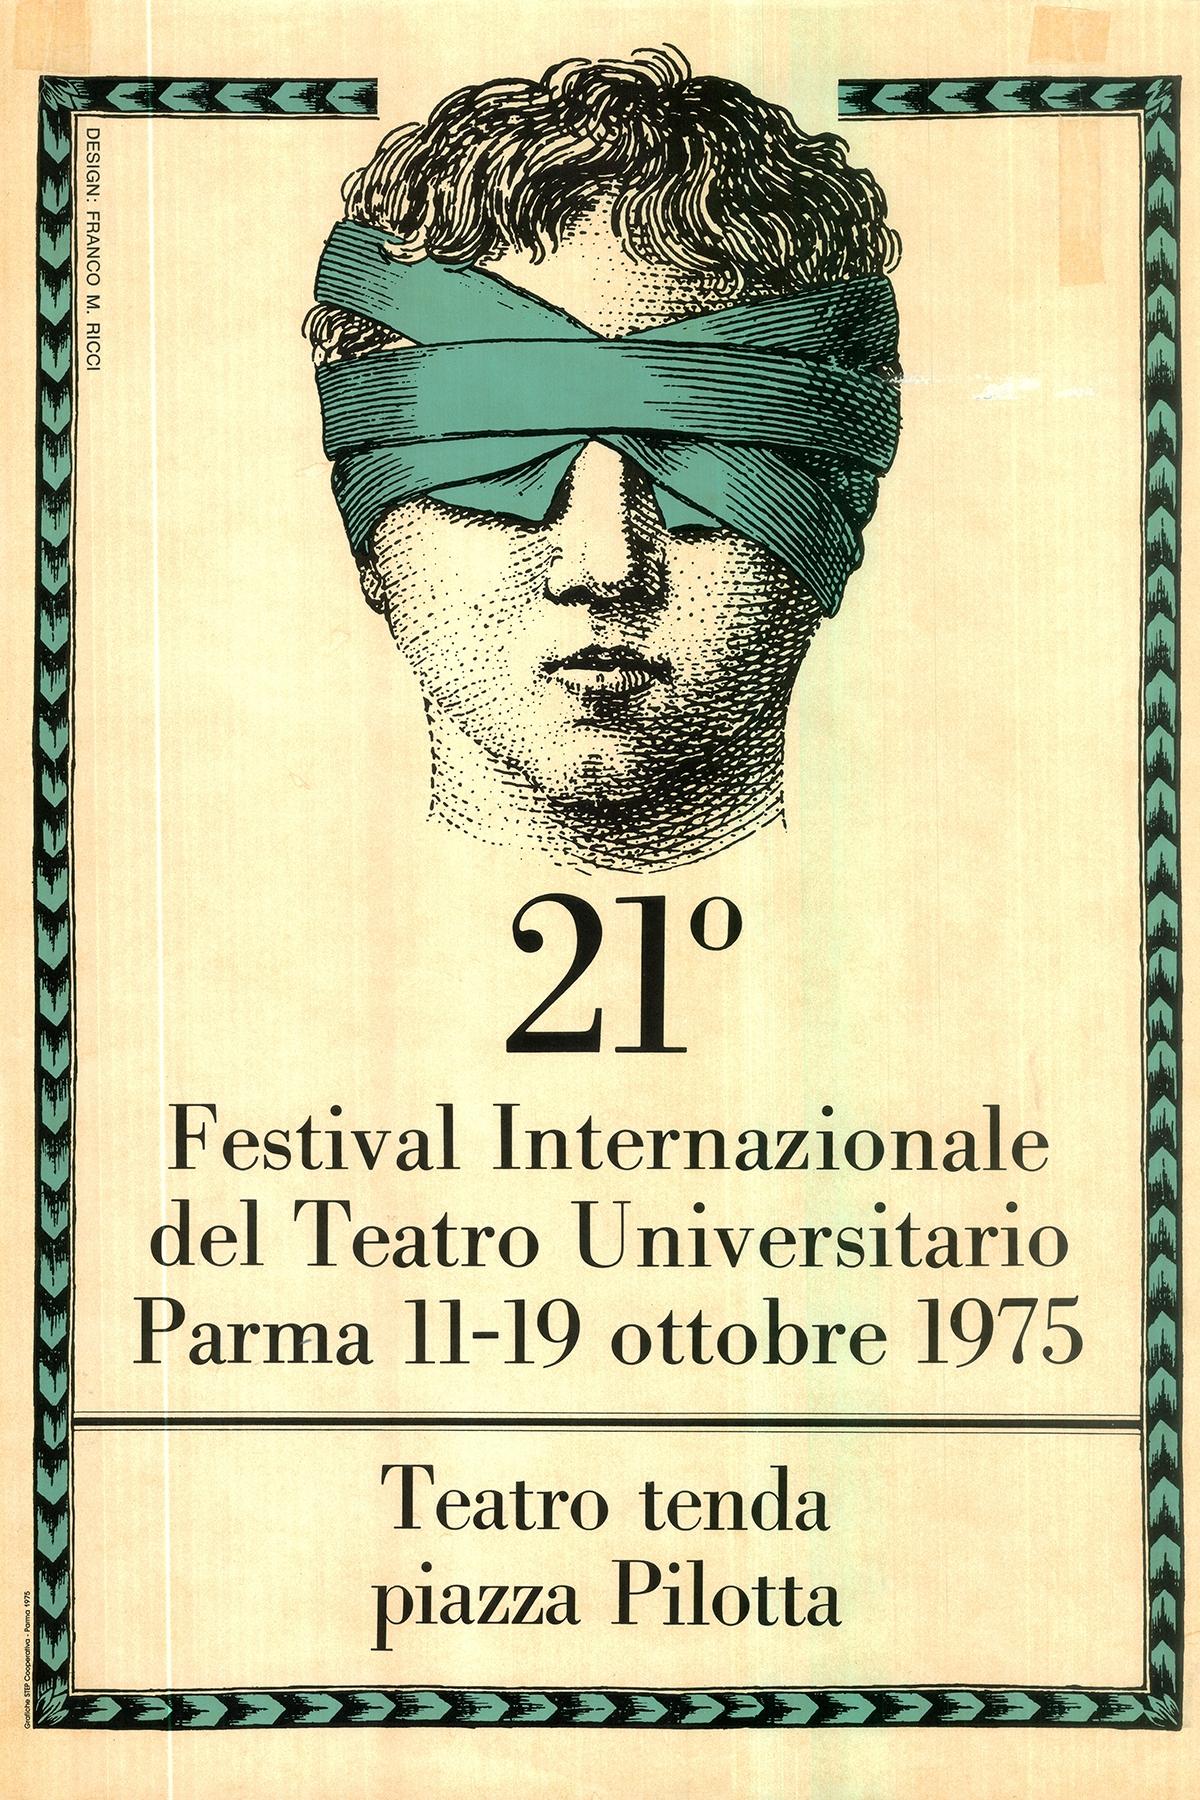 manifesto 21 festival teatro universitario franco maria ricci